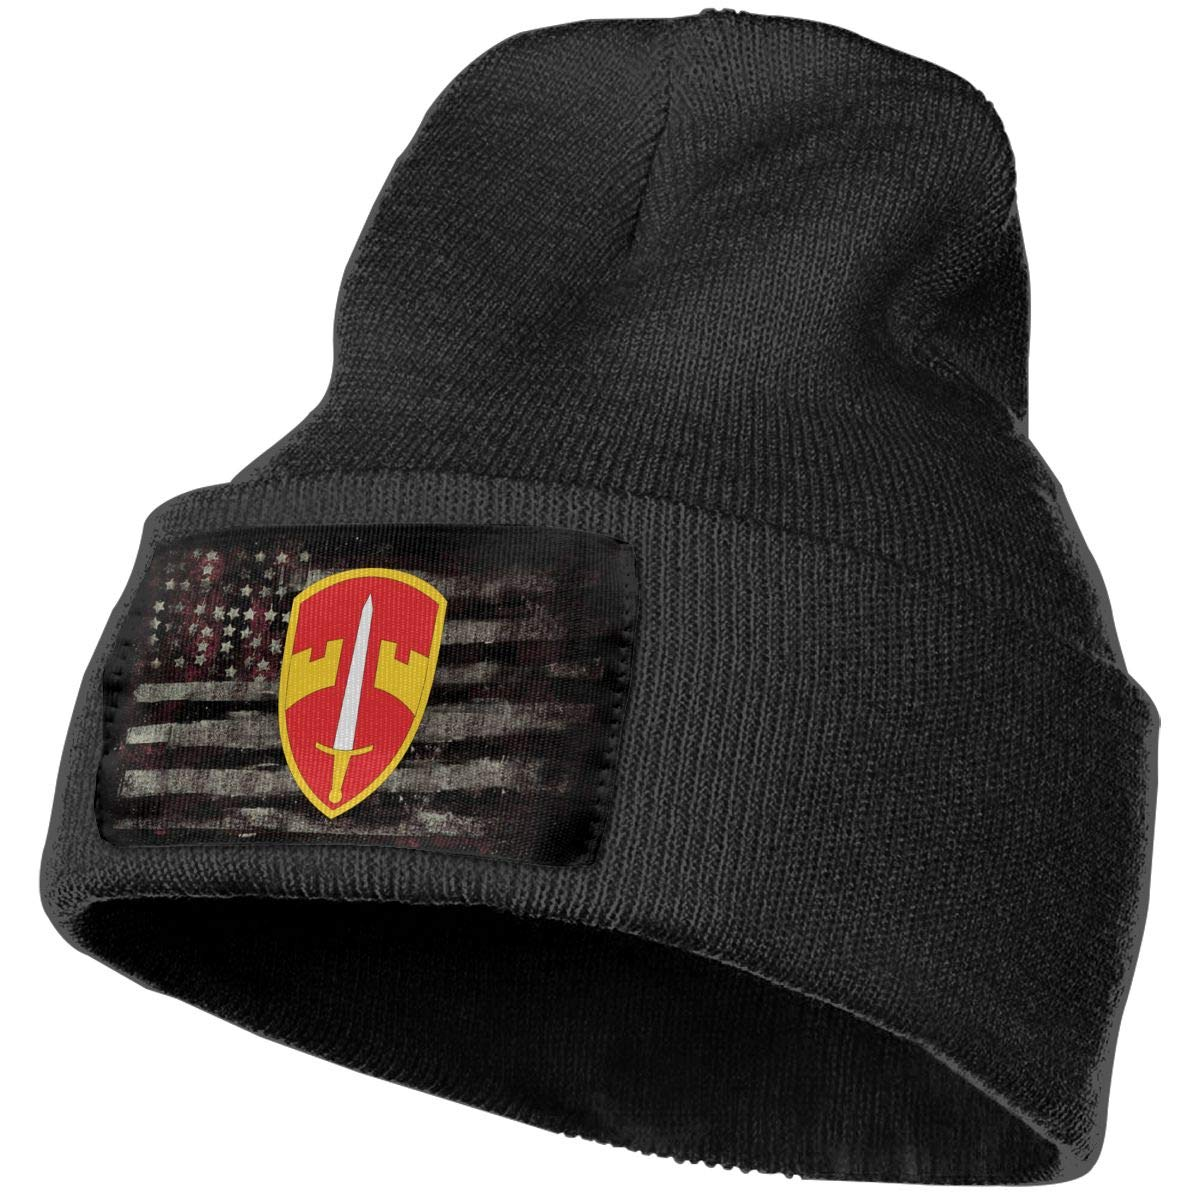 MACV Military Assistance Command Vietnam Mens Beanie Cap Skull Cap Winter Warm Knitting Hats.